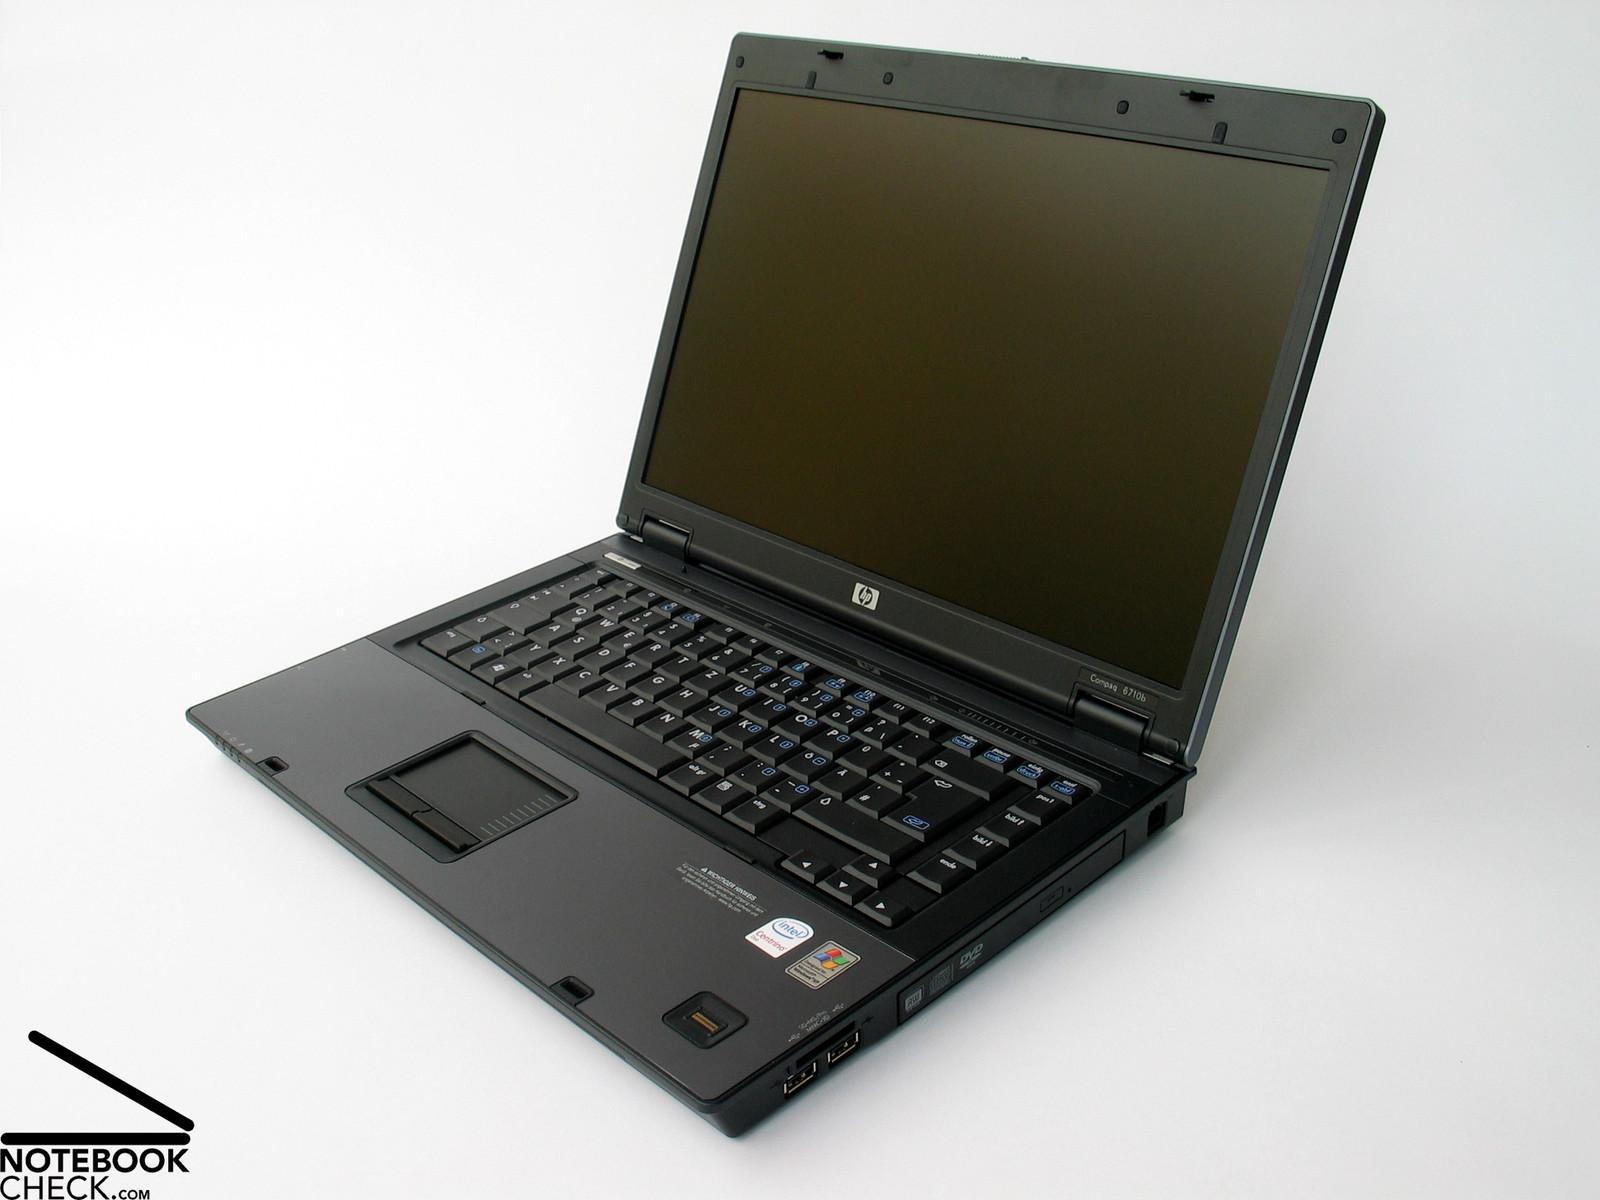 HP Compaq 6710bg